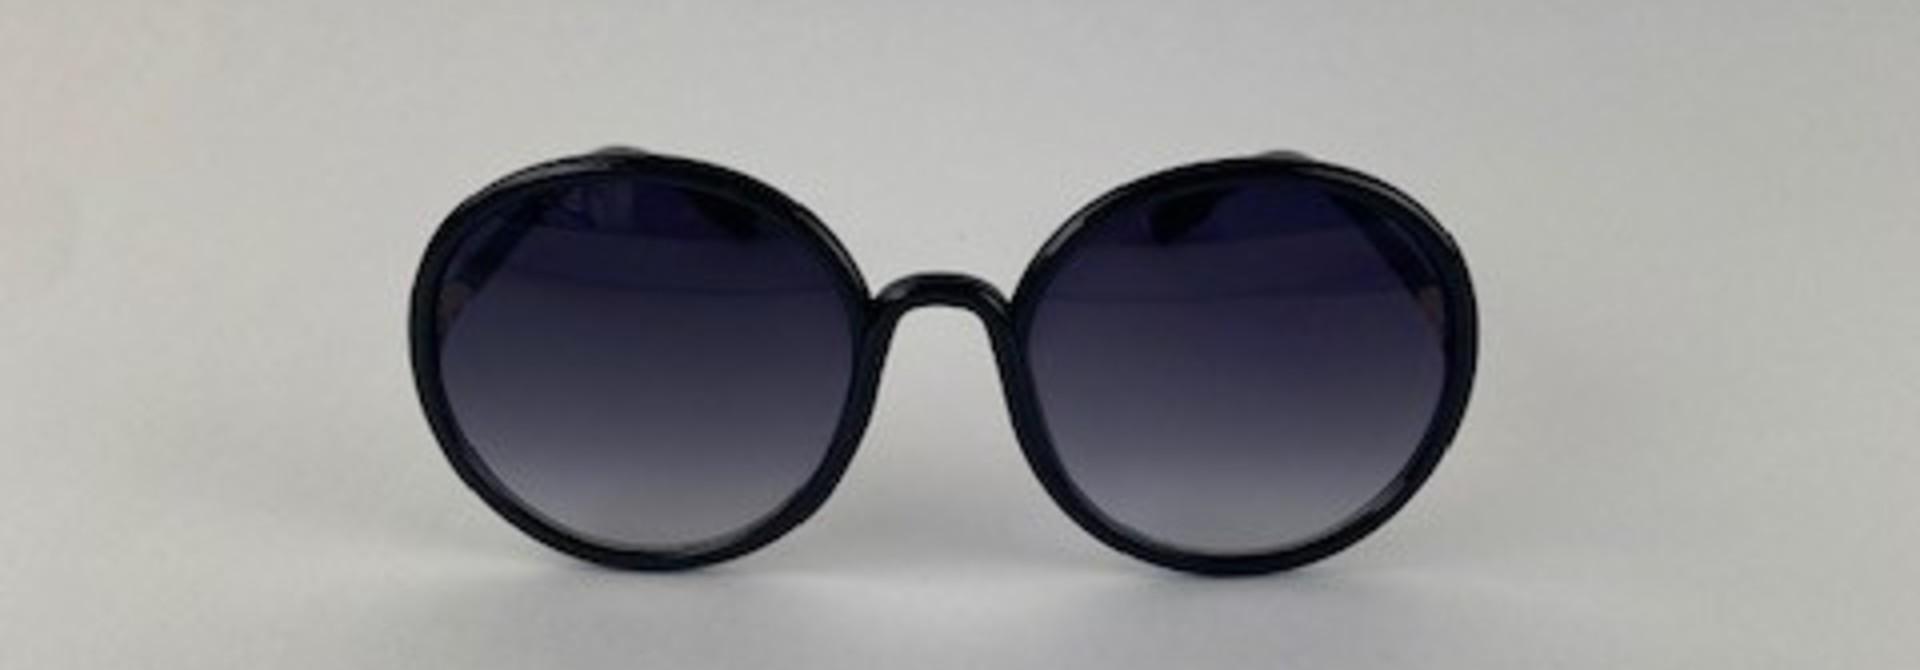 Janis sunnies Black